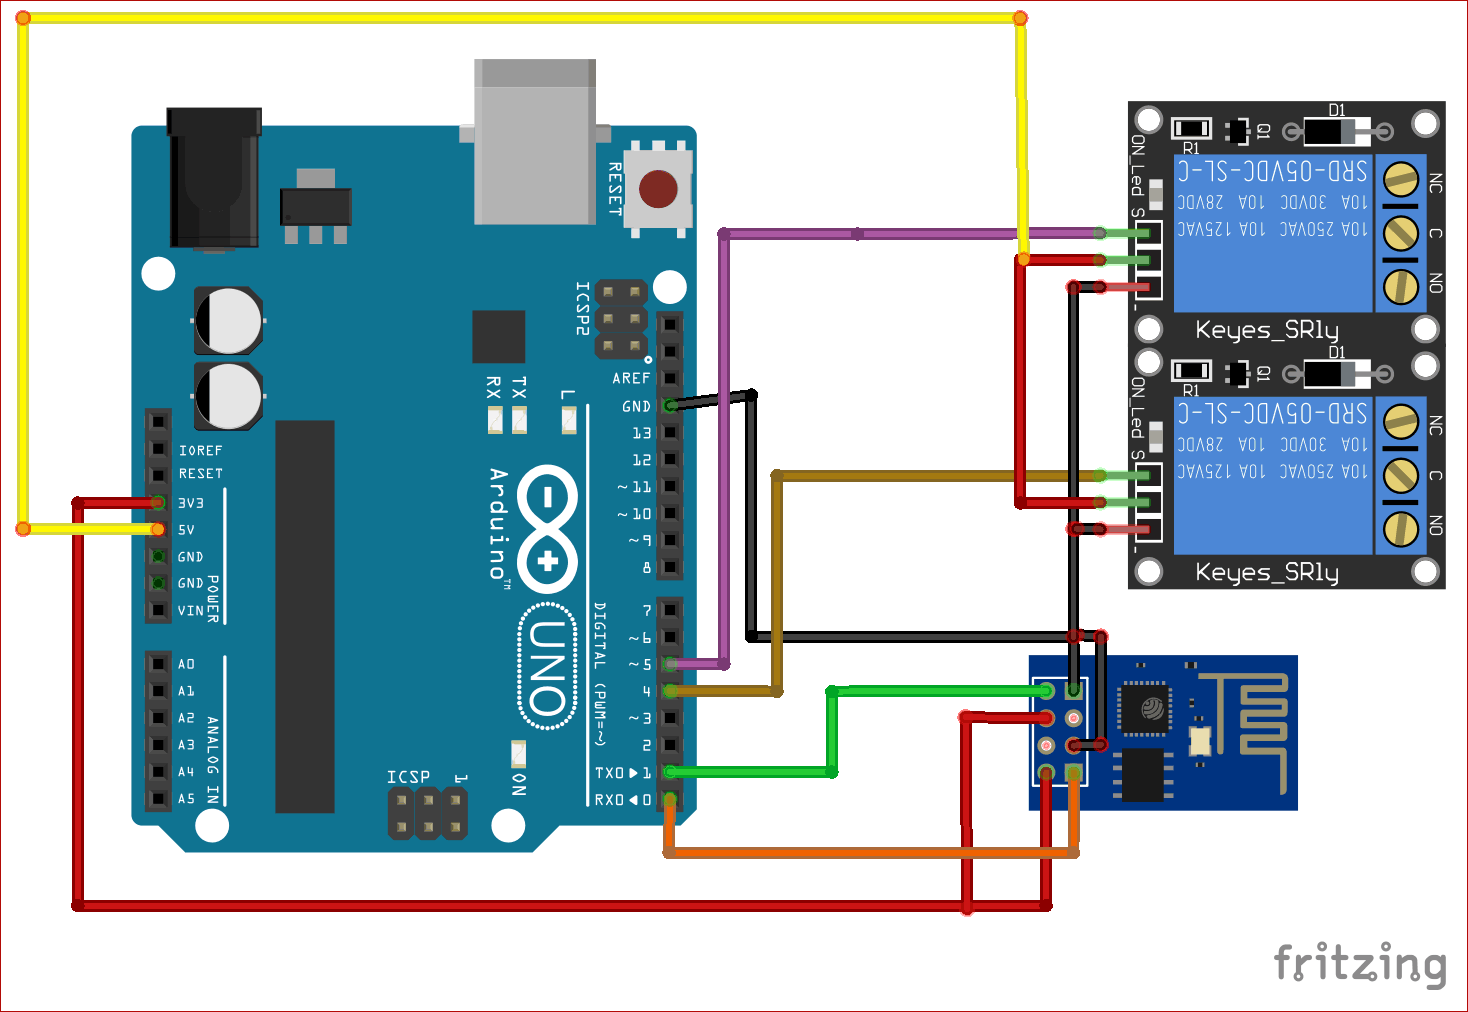 Circuit Diagram For Arduino Based Amazon Alexa Controlled Home Automation Arduino Amazon Alexa Home Automation